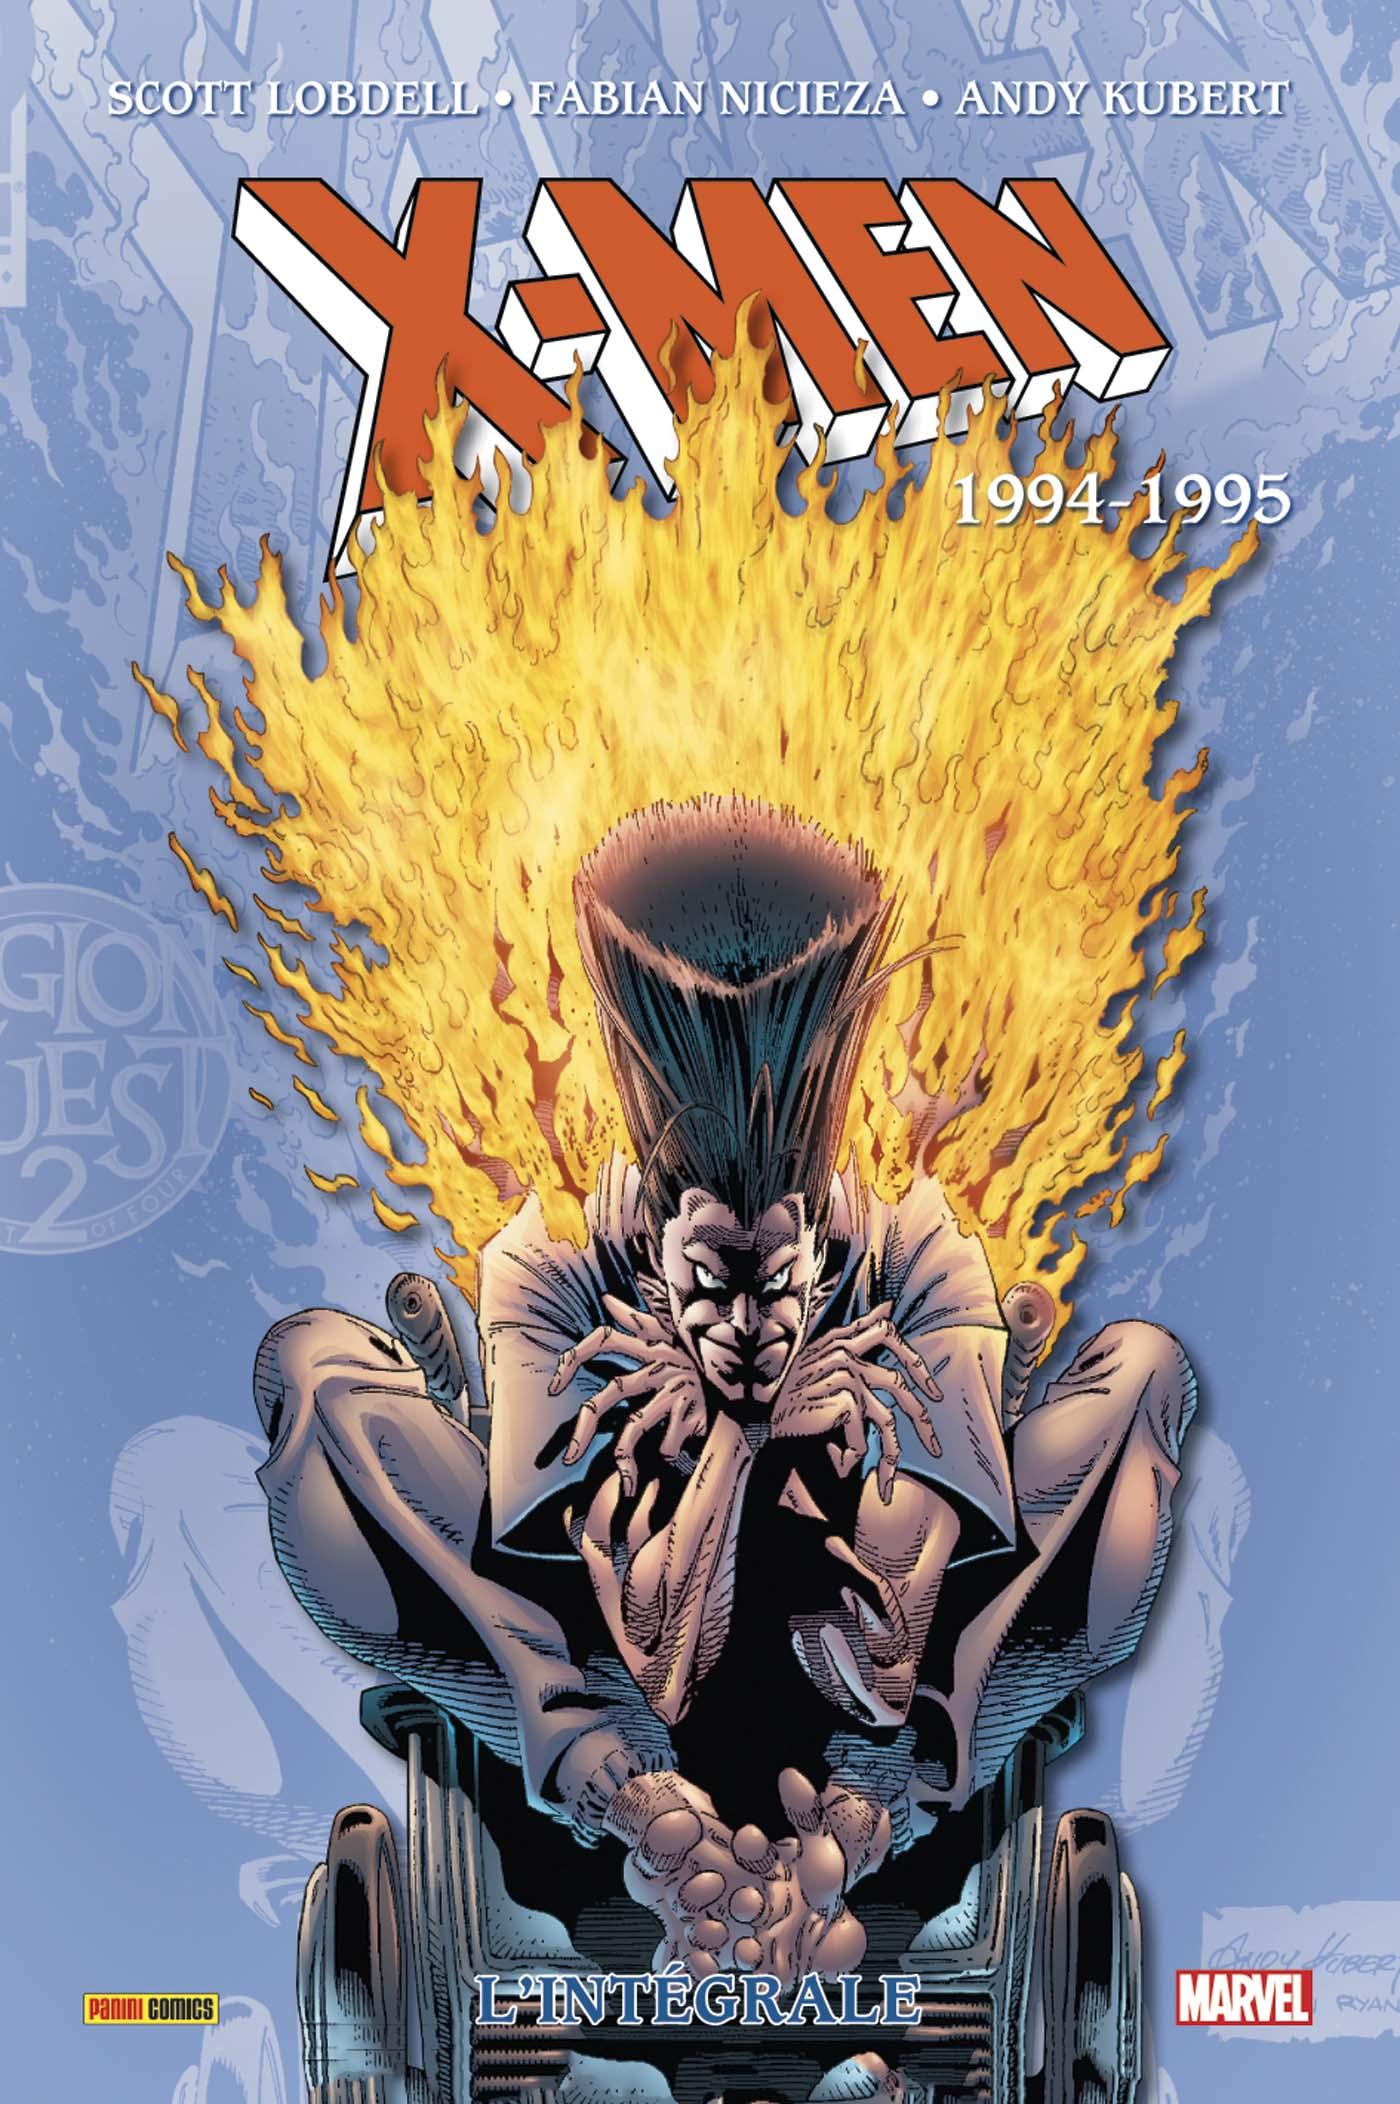 X-Men 1994.4 - 1994-1995